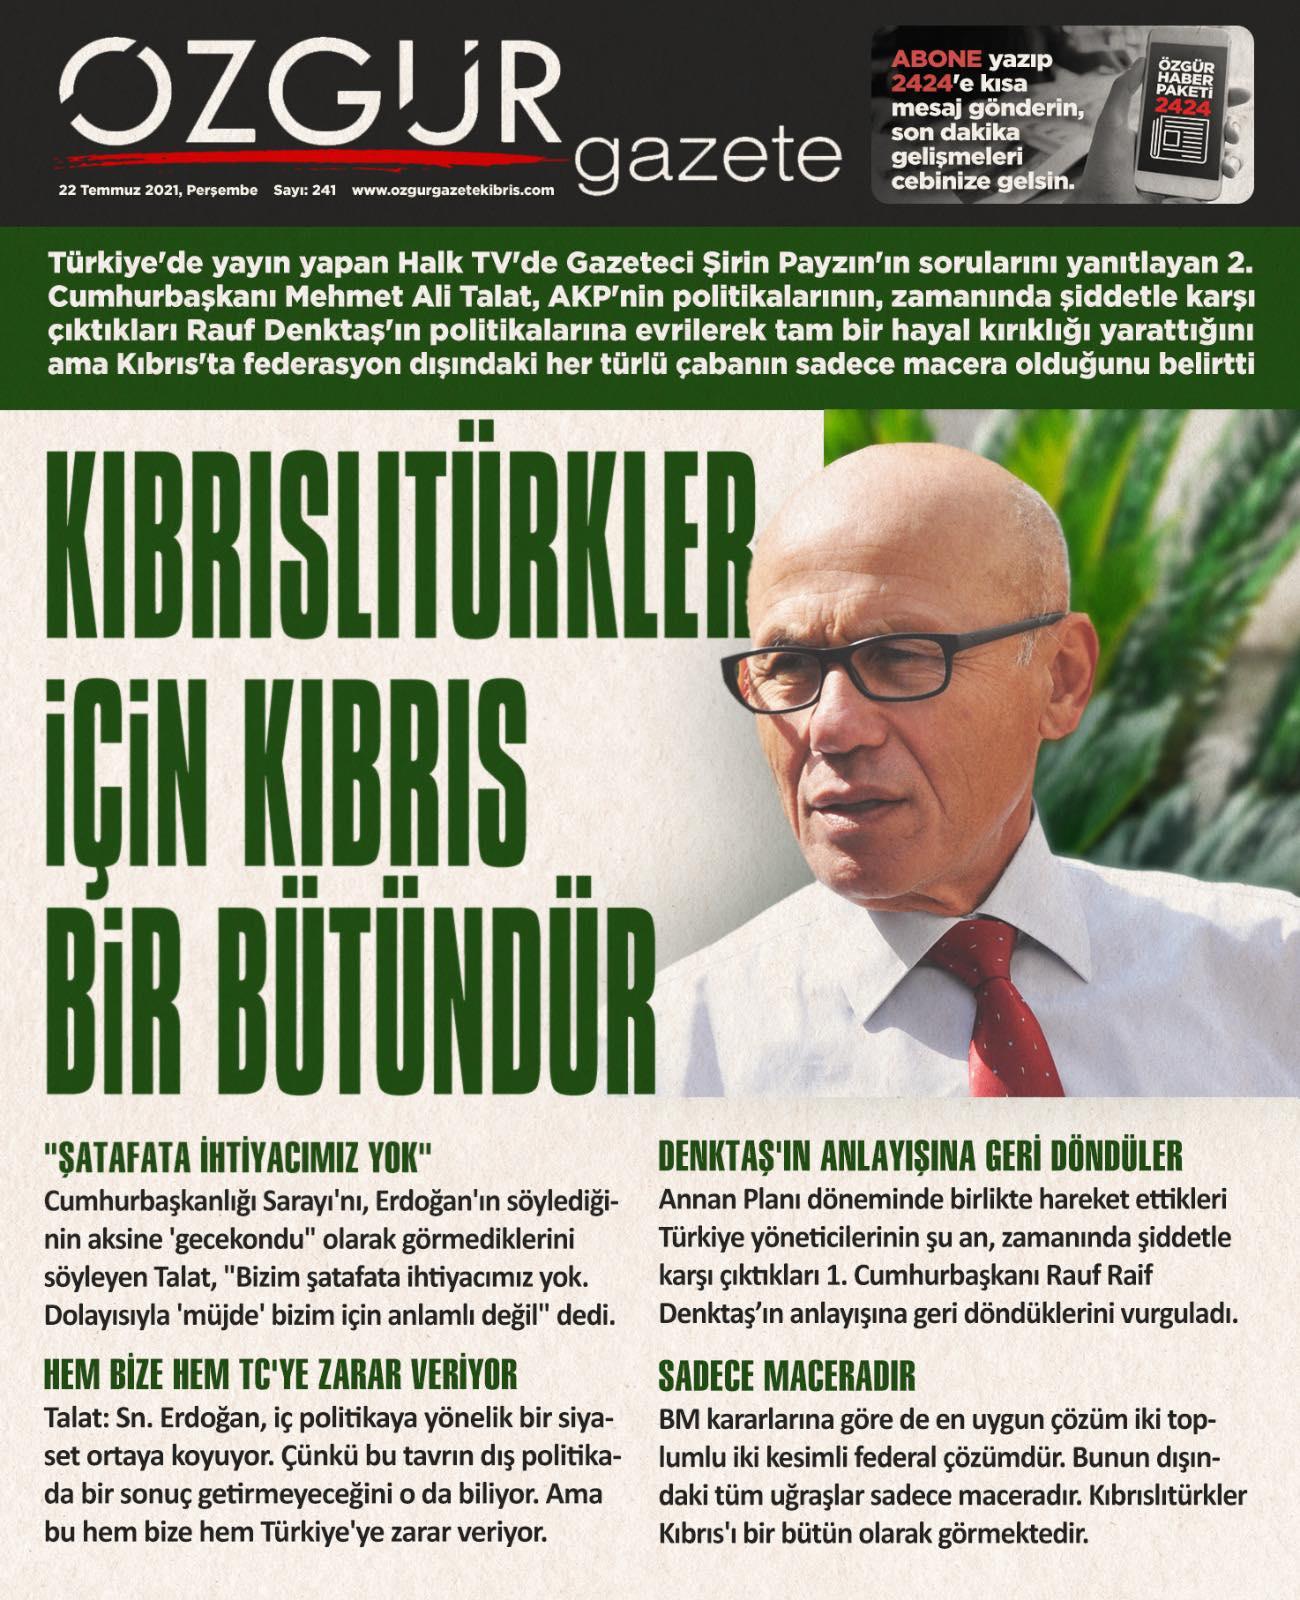 ozgur_gazete_kibris_Talat_manşet